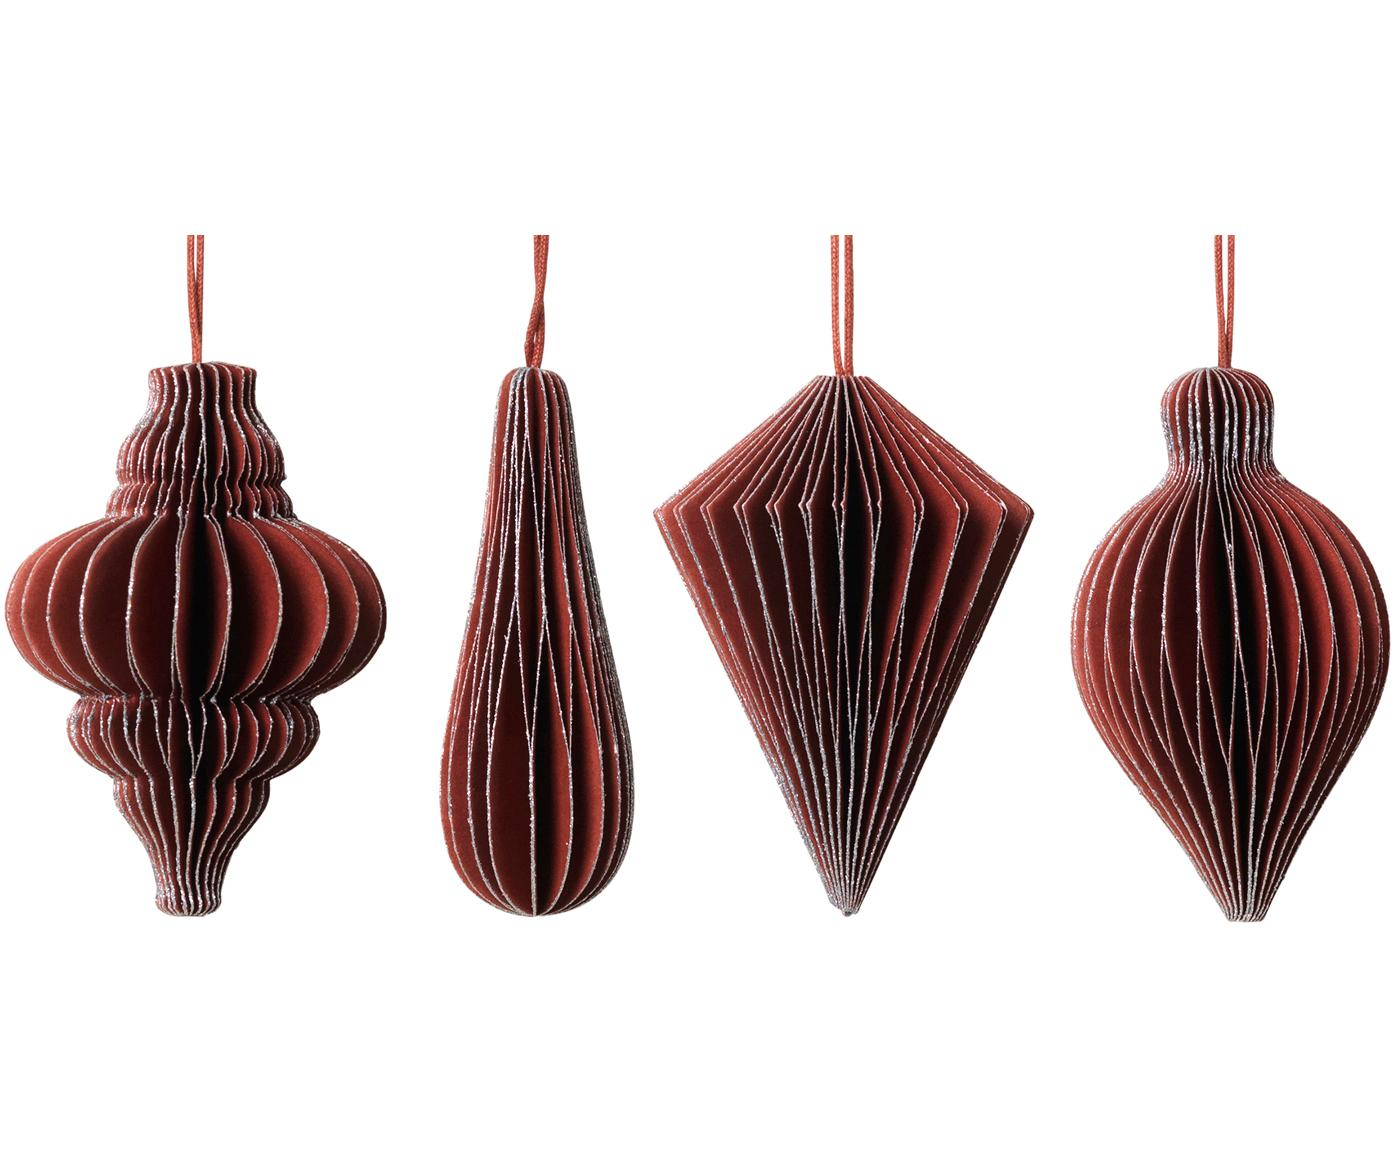 Baumanhänger-Set Winnie, 4-tlg., Papier, Rot, Silberfarben, Ø 5 x H 7 cm